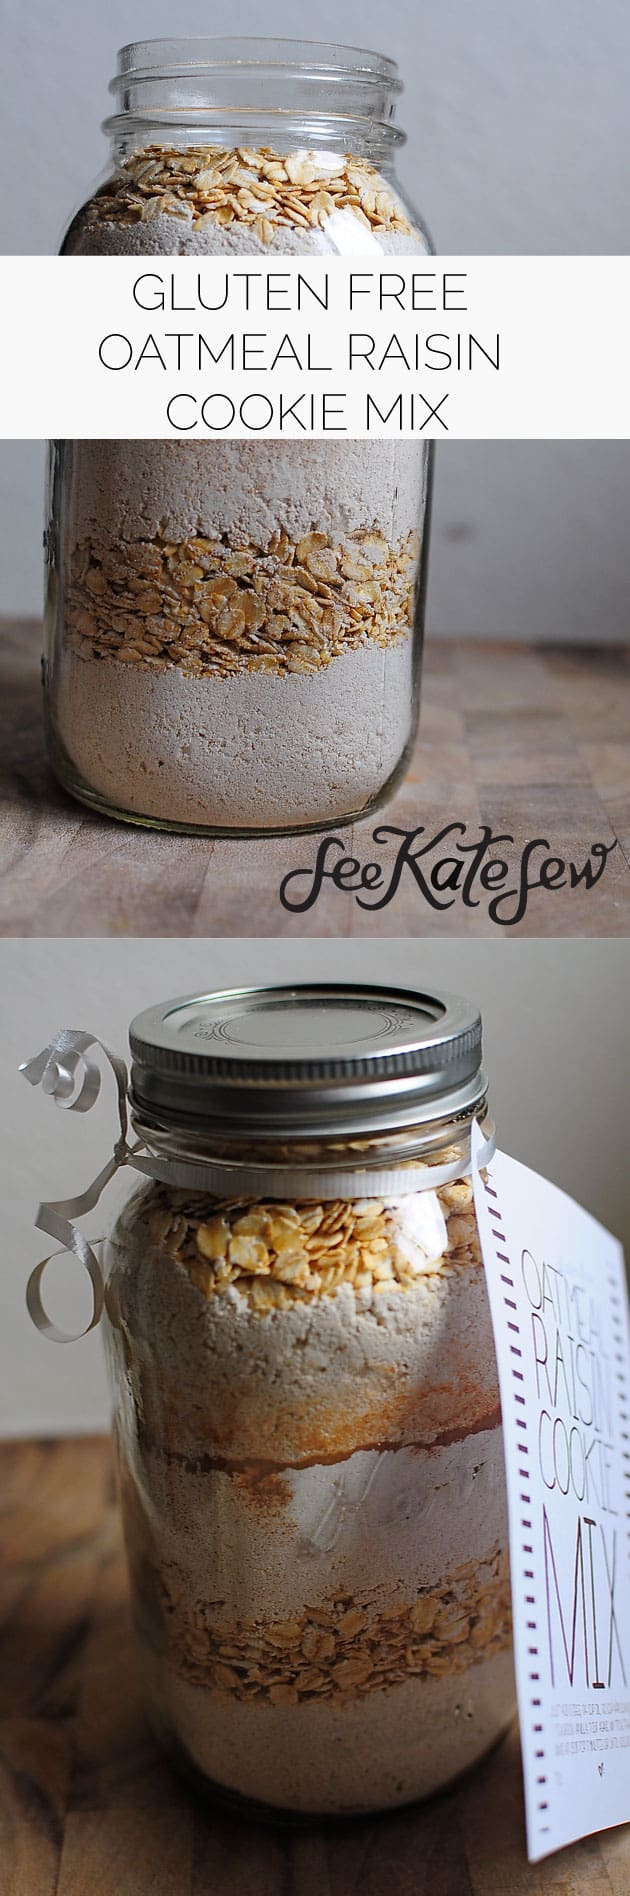 Gluten Free Oatmeal Raisin Cookie Mix|See Kate Sew